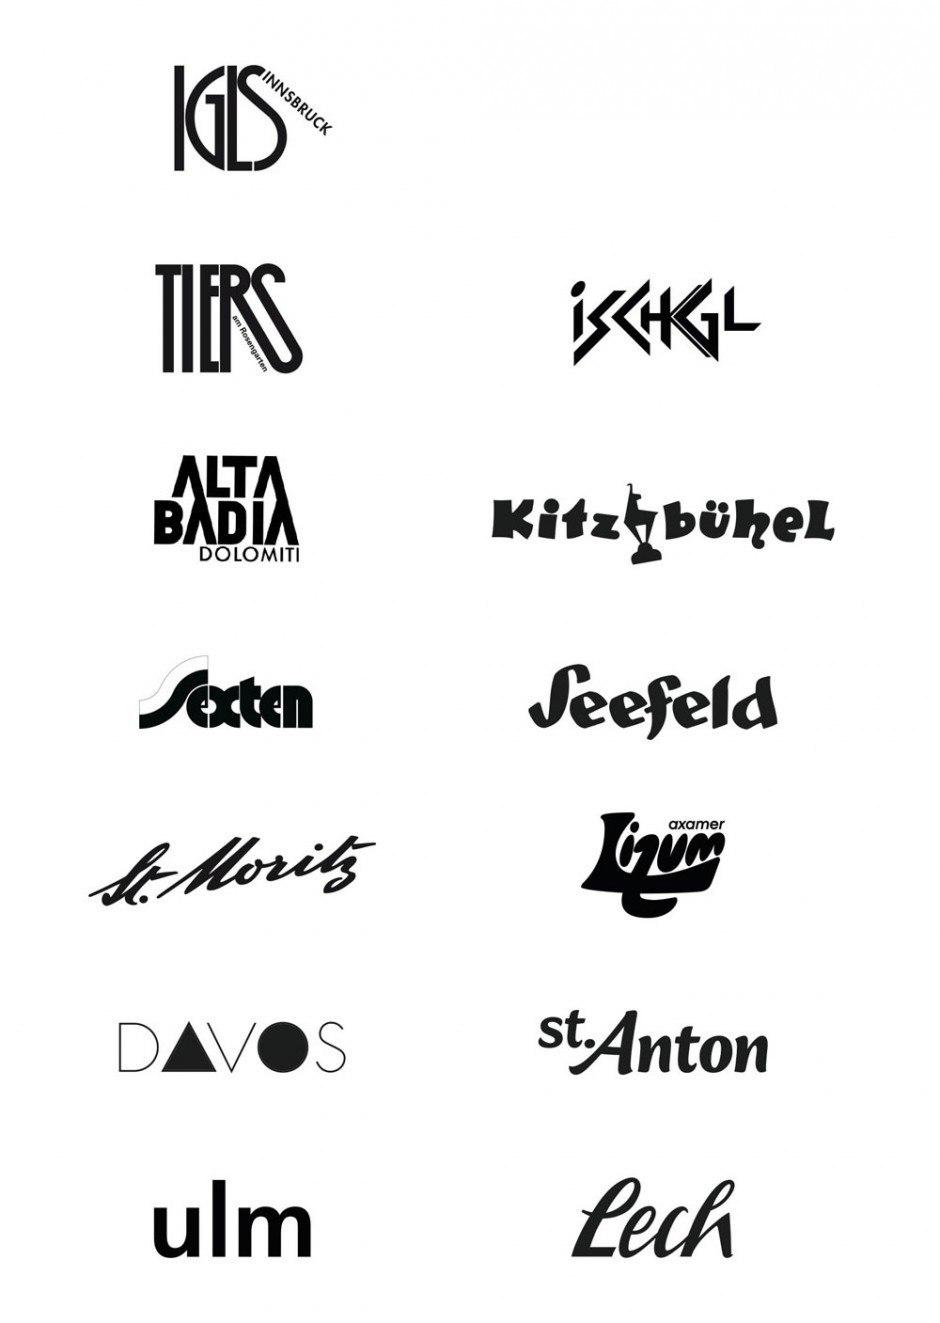 Arthur Zelger, Igls-Innsbruck, Tiers am Rosengarten (1990), Alta Badia, Dolomiti (um 1970), Sexten (um 1987), Axamer Lizum (um 1900)Walter Herdegg, St. Moritz (ca. 1930); Joseph Breuer / Hermann Ay, Ulm (1988); Loft Advertising München, Ischgl (1990); Alfons Walde, Kitzbühel (1933); Kurt Höretzeder, St. Anton (2006); Unbekannt, Davos, Seefeld, Lech